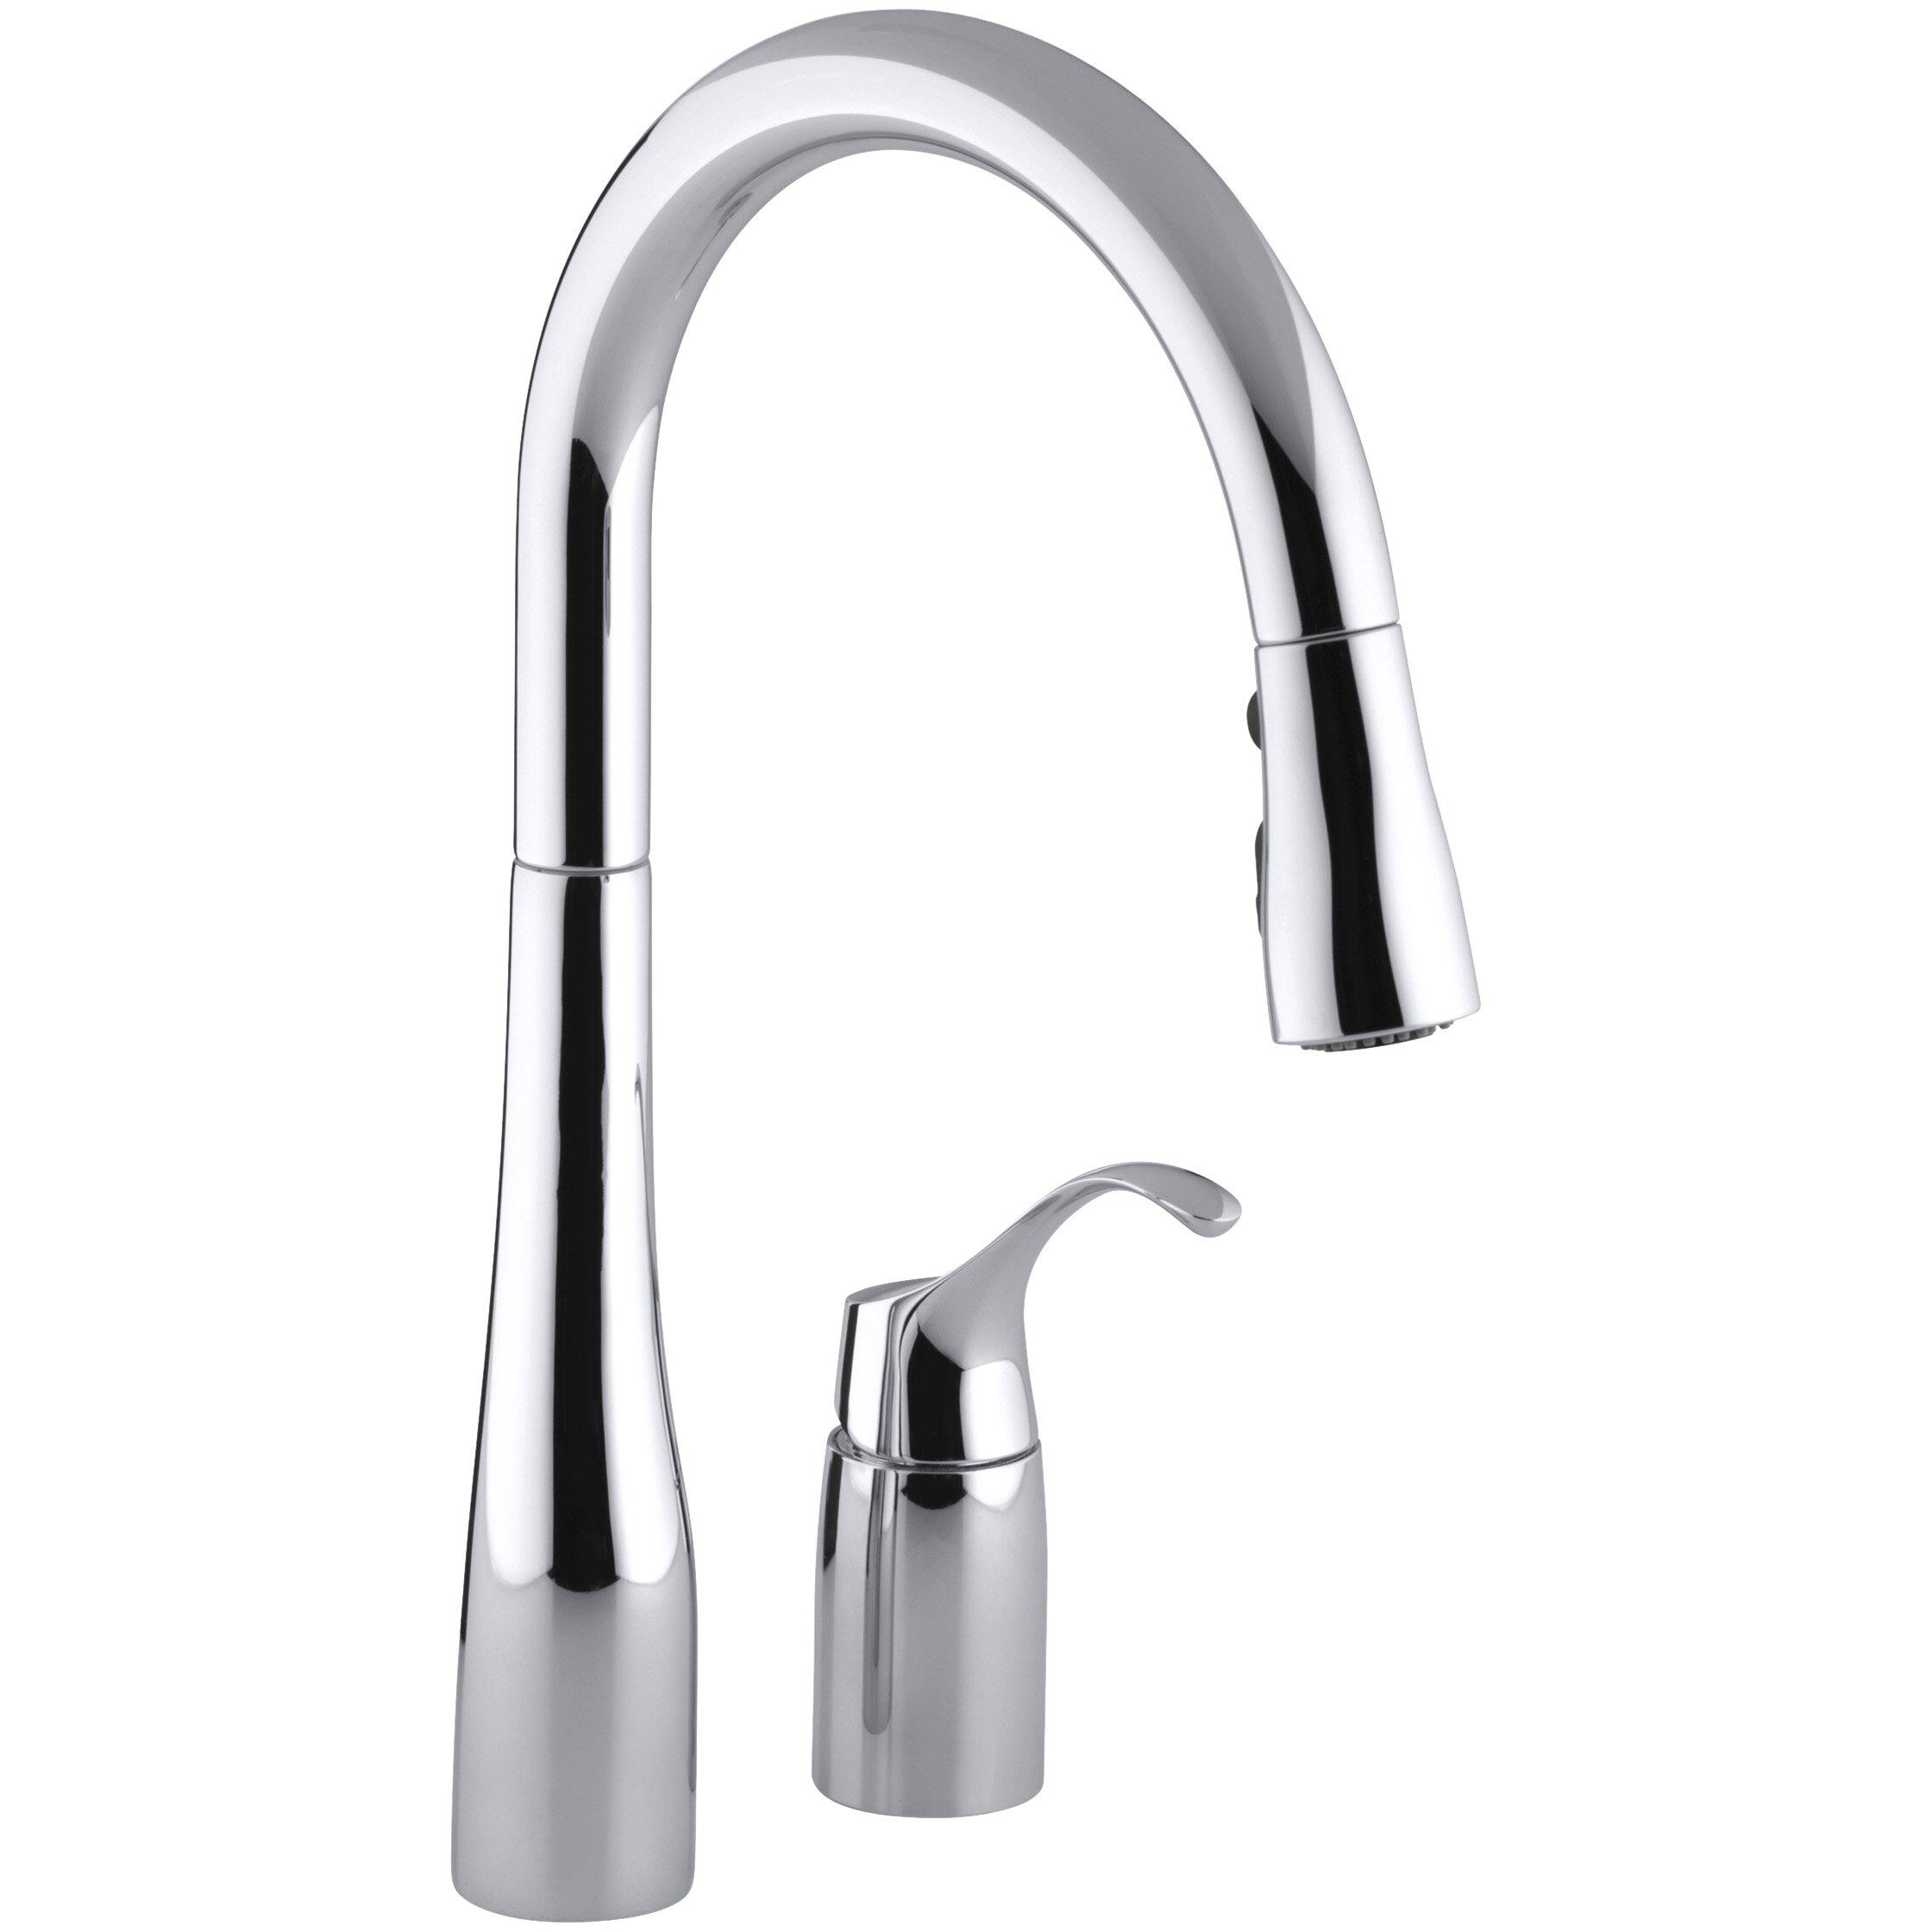 Kohler Kitchen Faucet Leaking